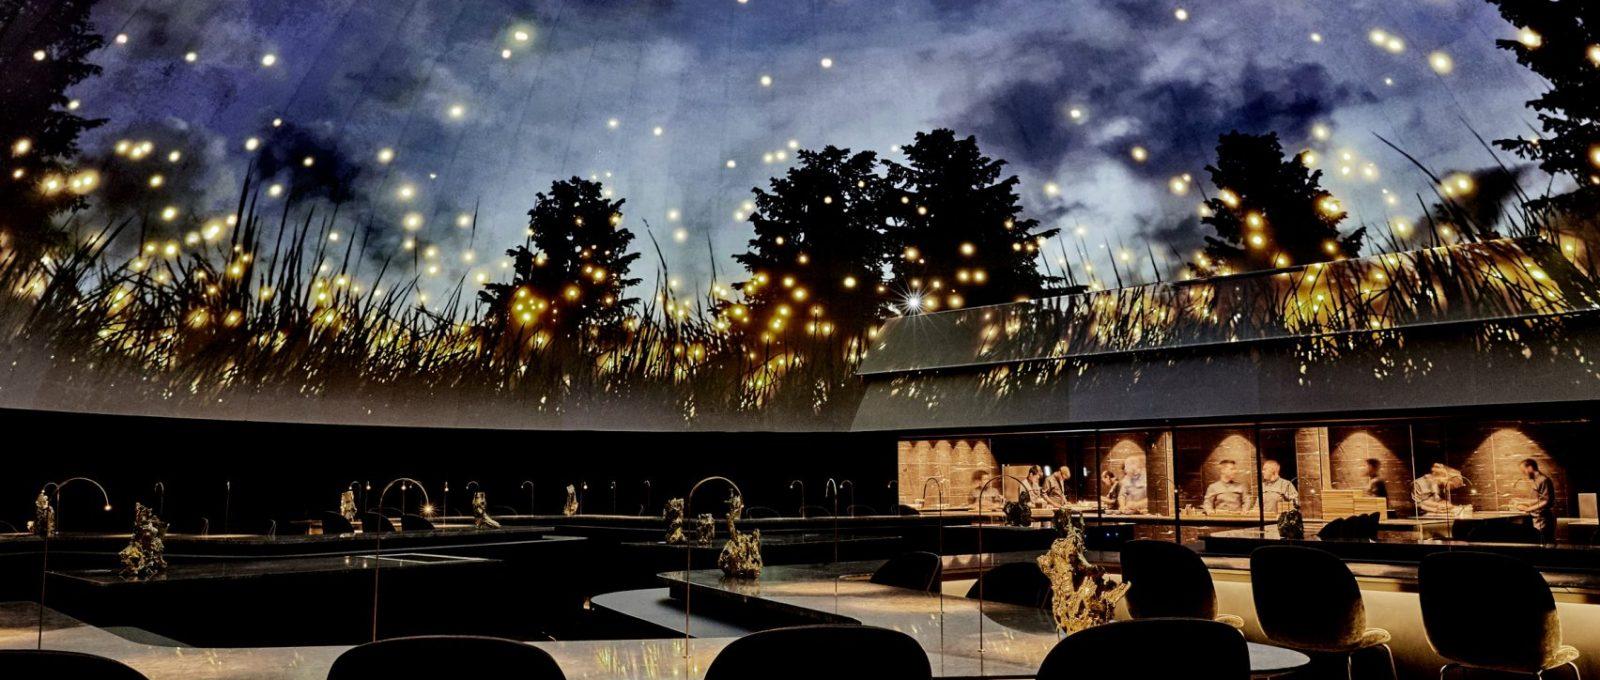 Alchemist, the restaurant where dinner becomes a show